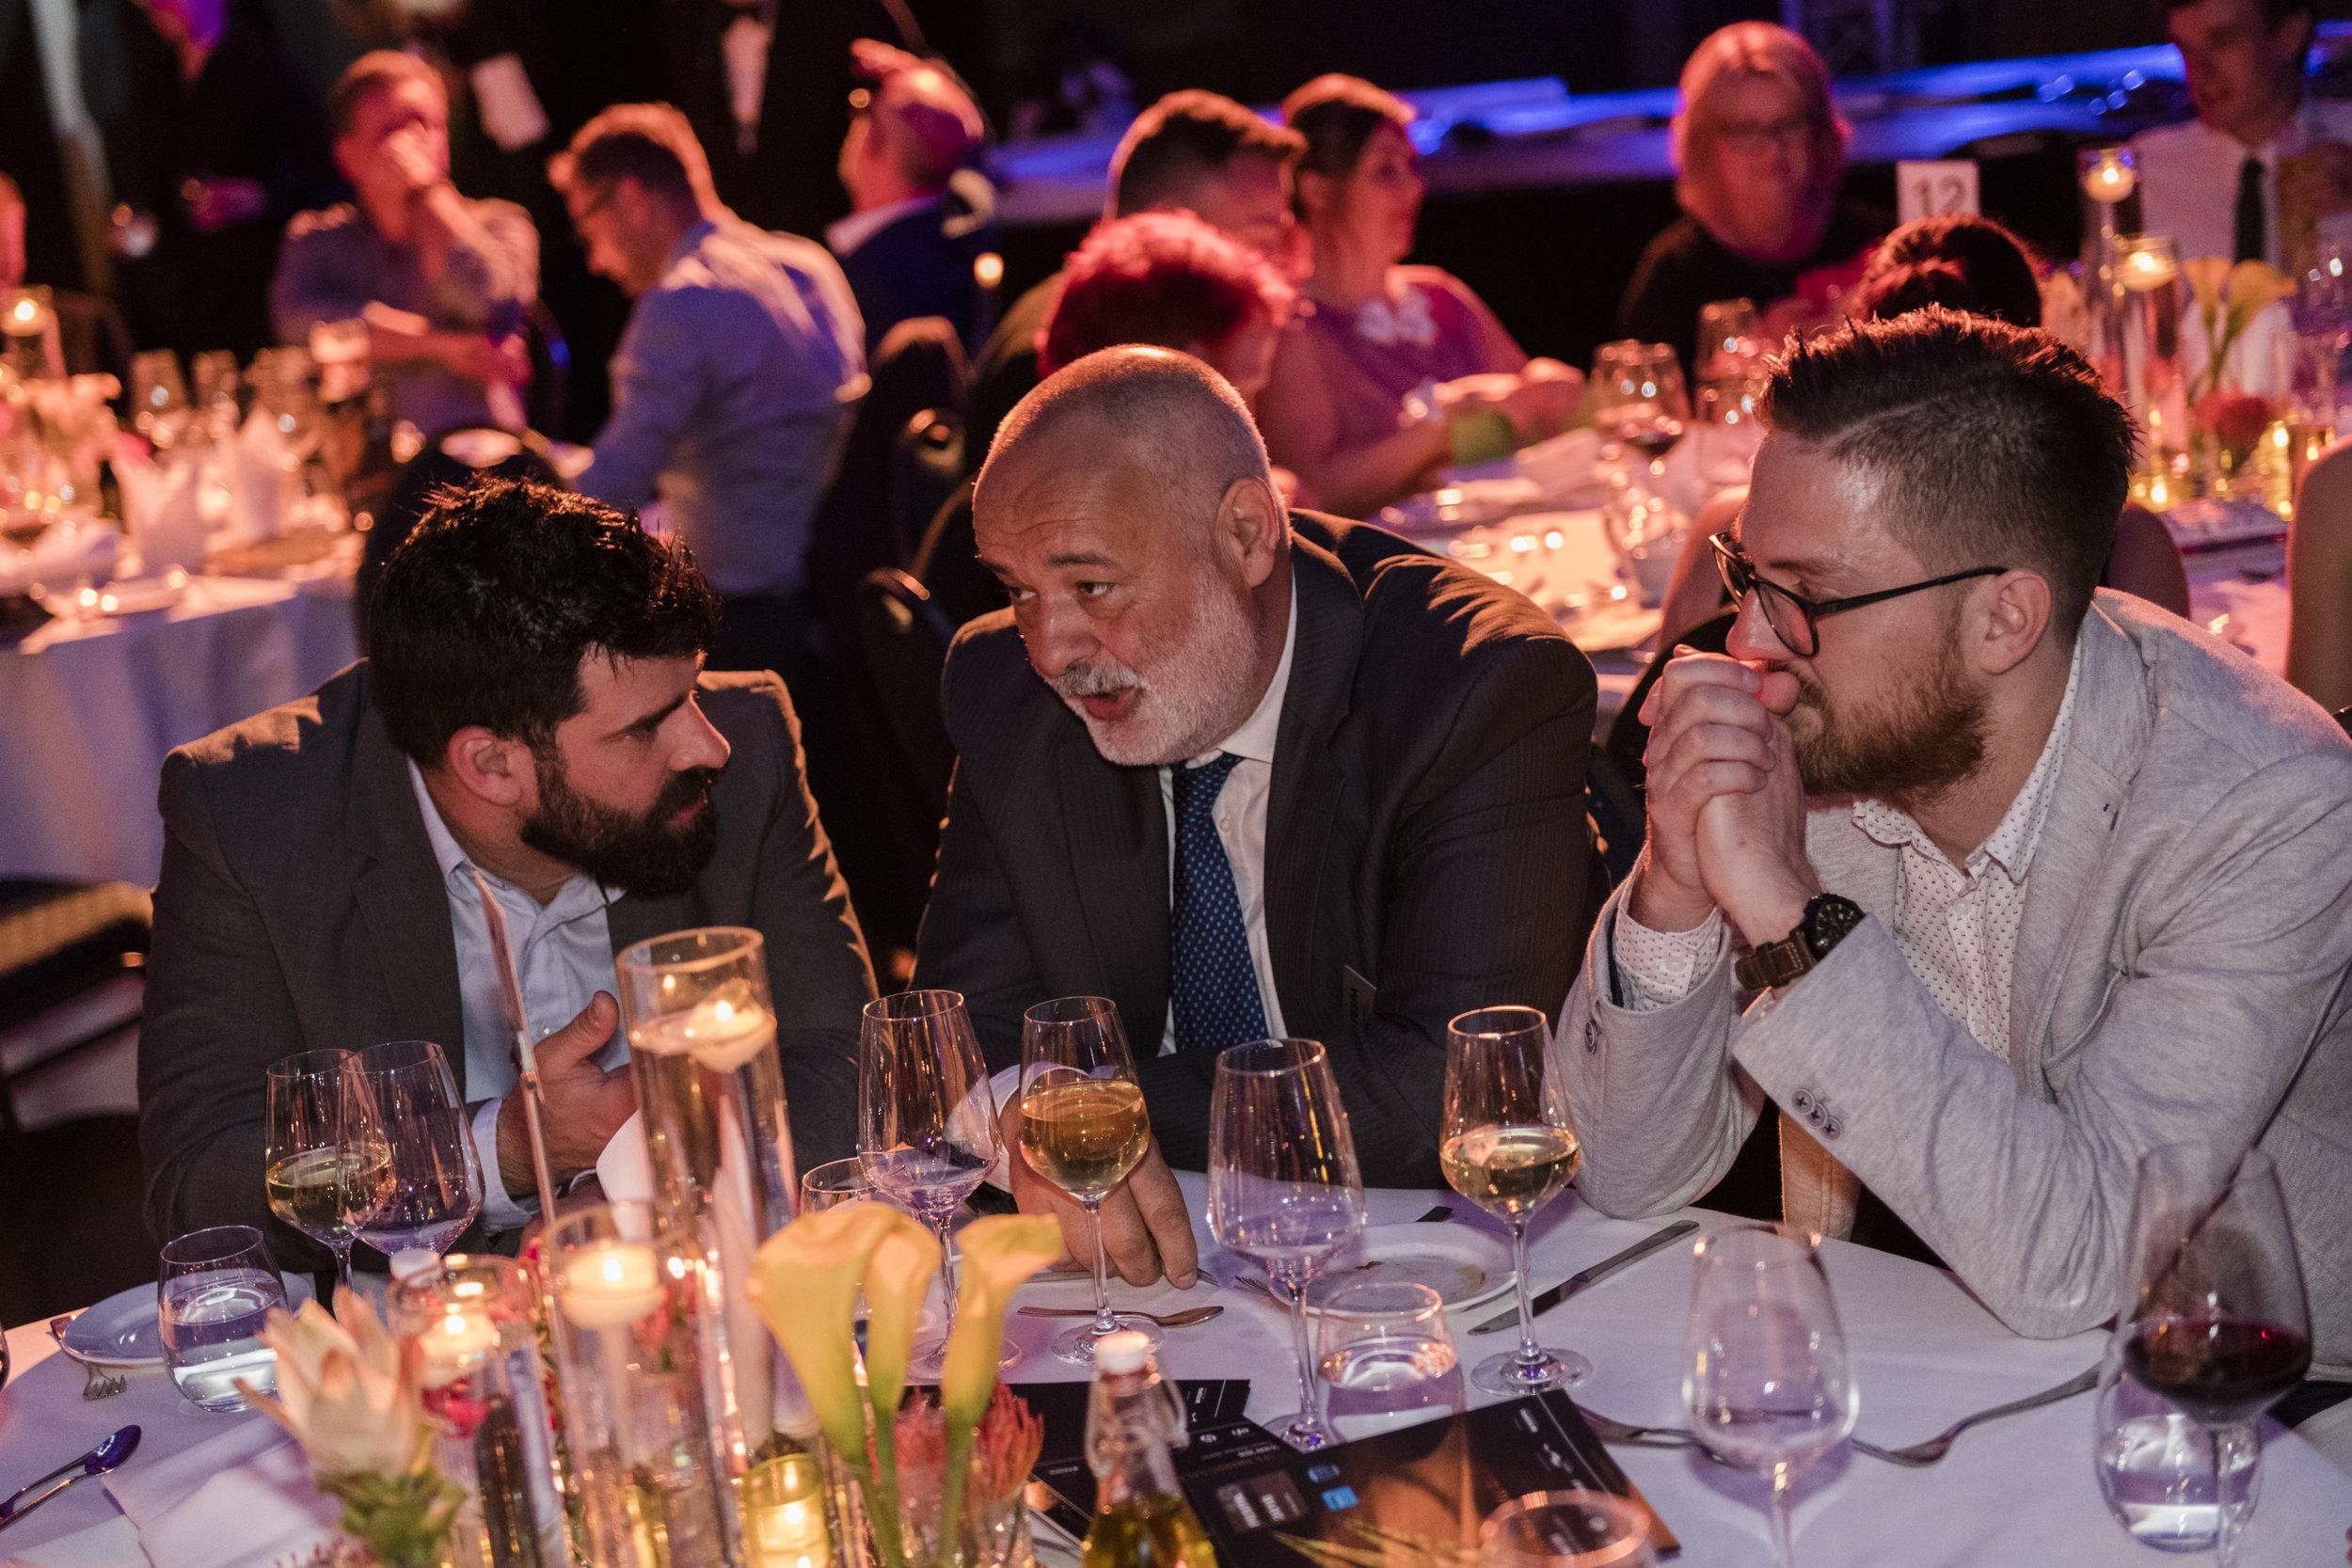 2018-05-16_FESPA_Awards_0132.jpg